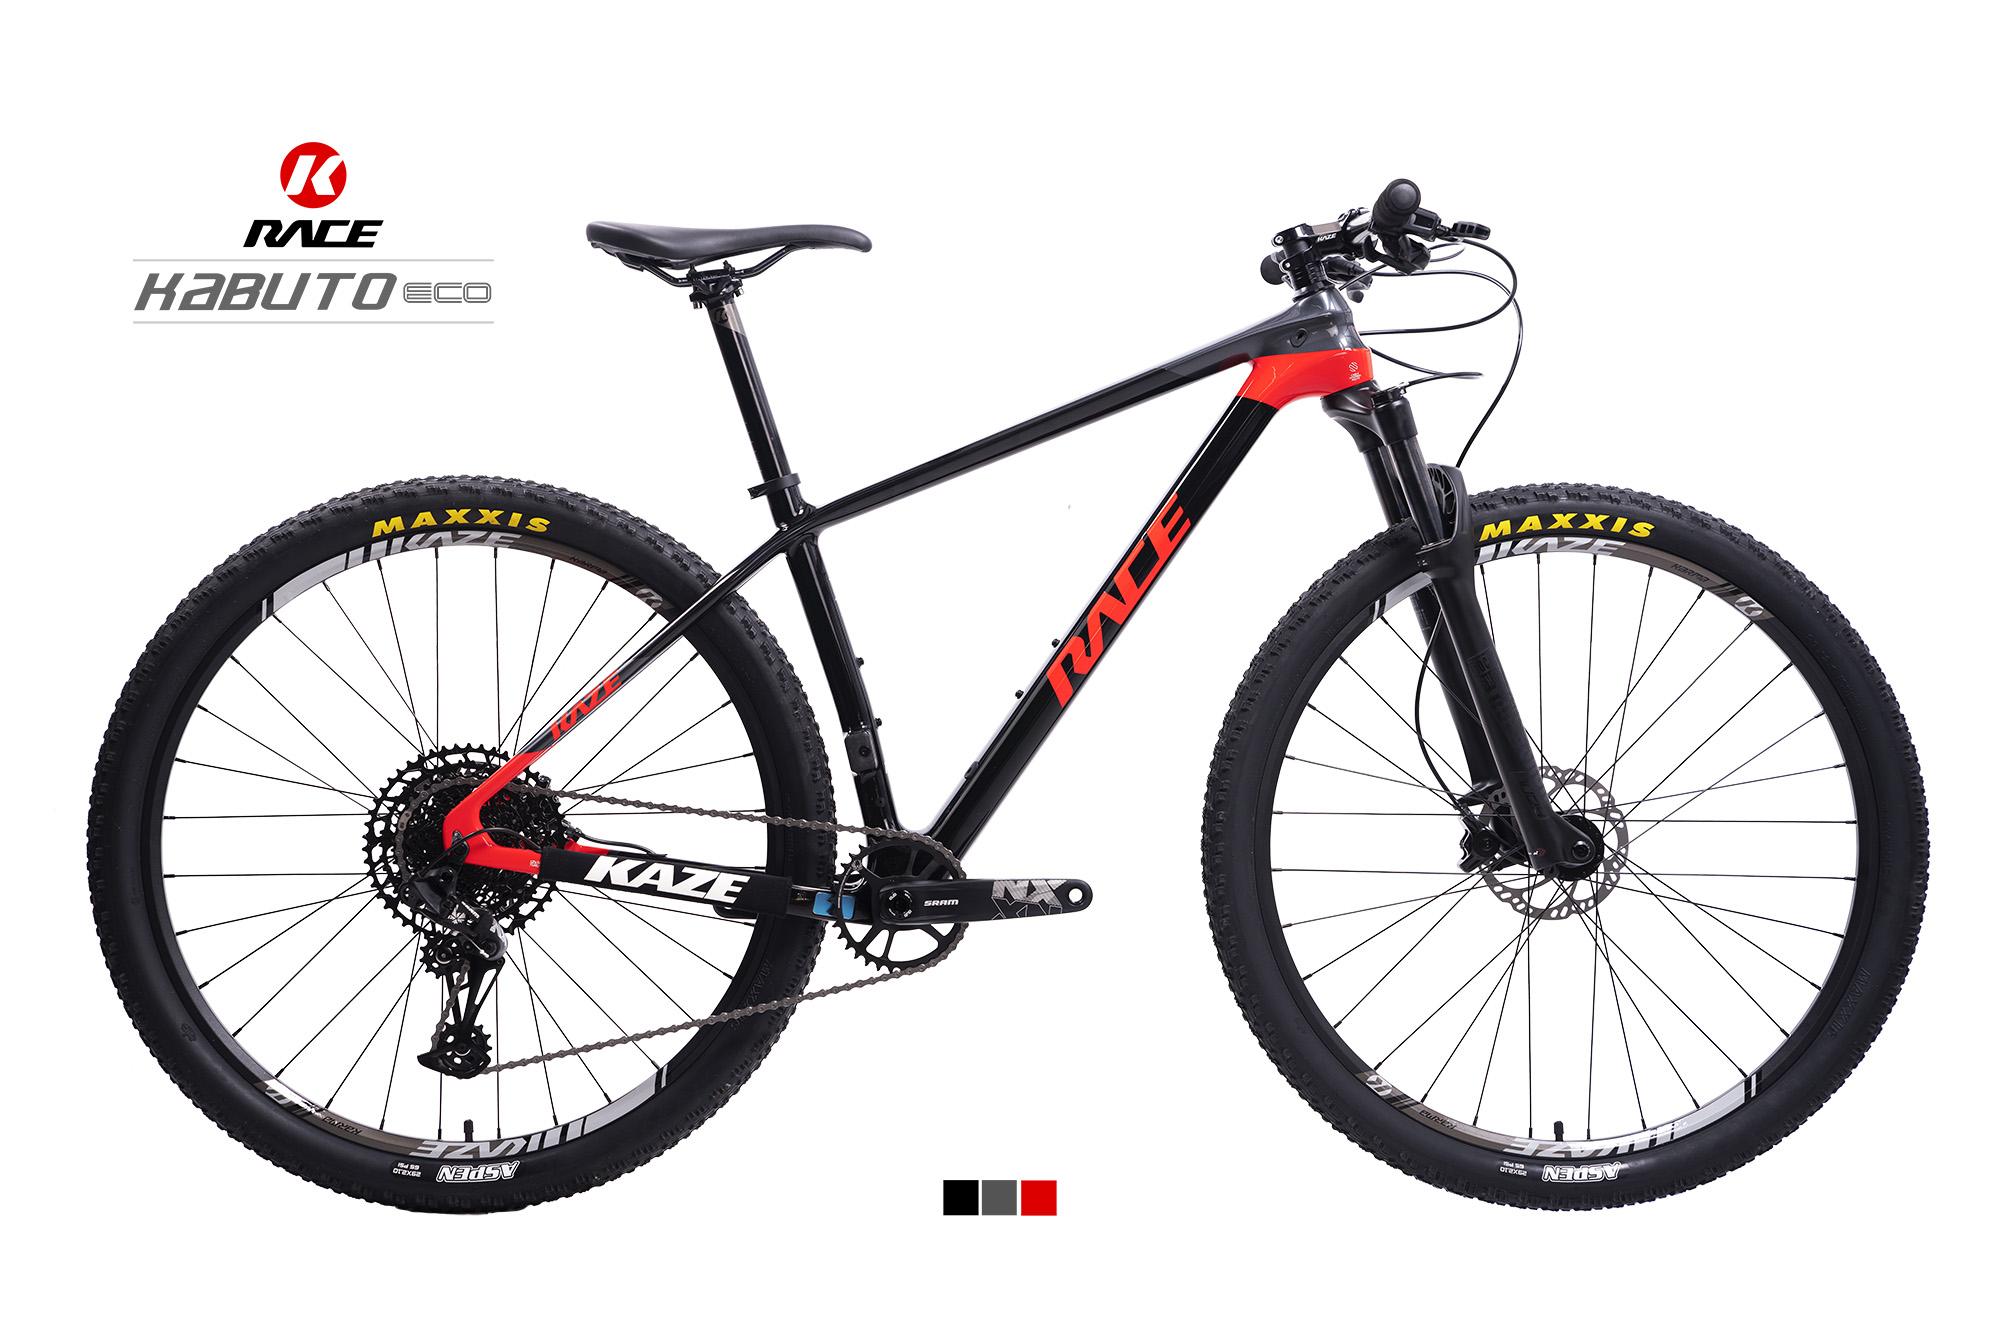 KAZE RACE - KABUTO 29er ECO (Economic Version)